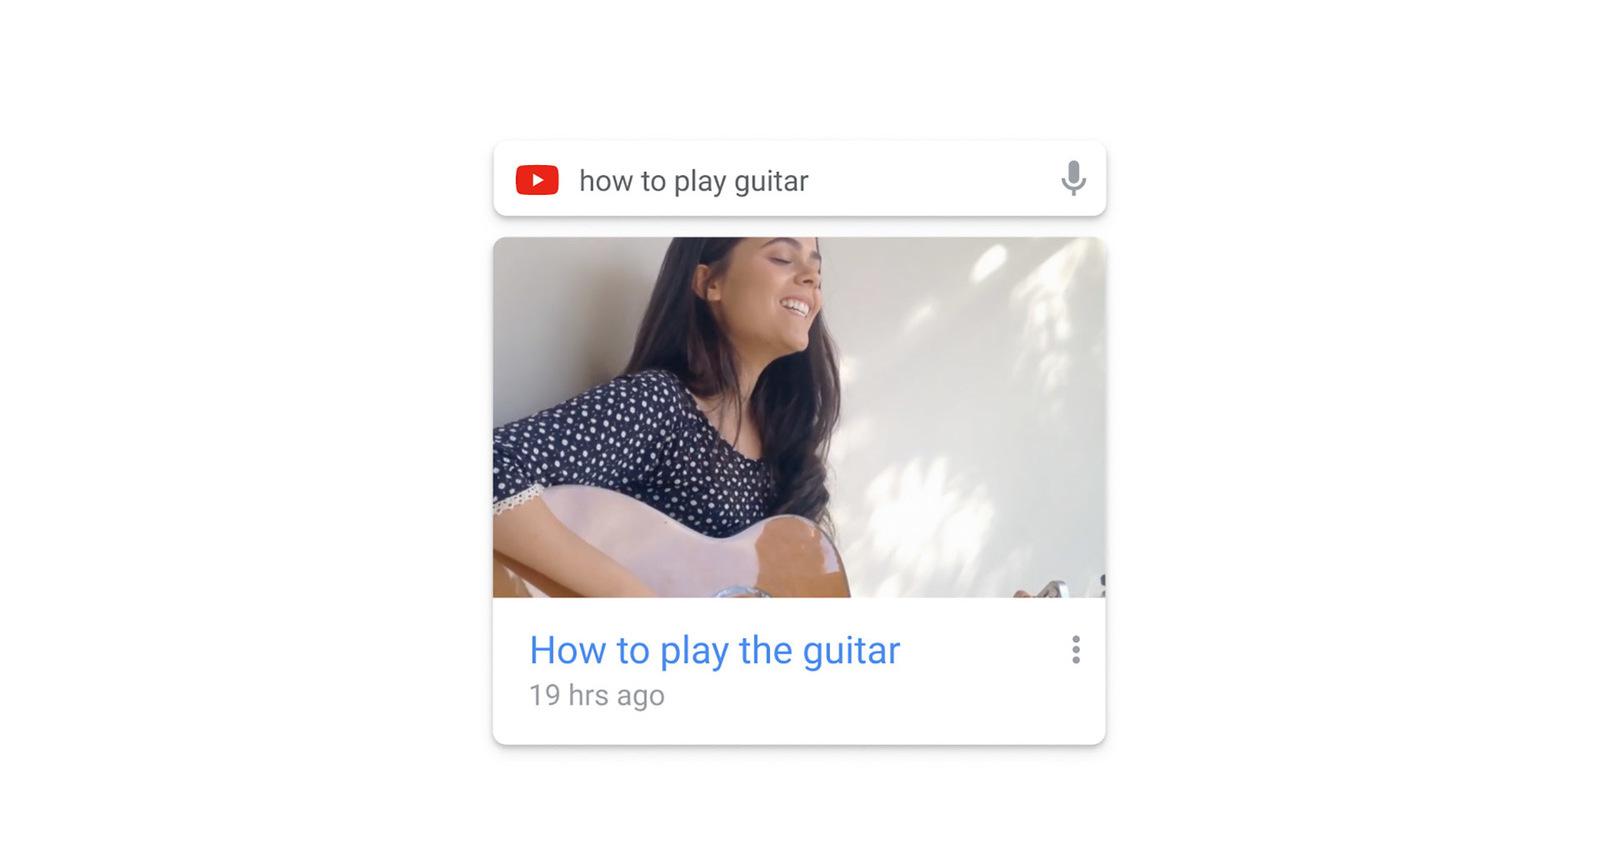 Google Helpfulness